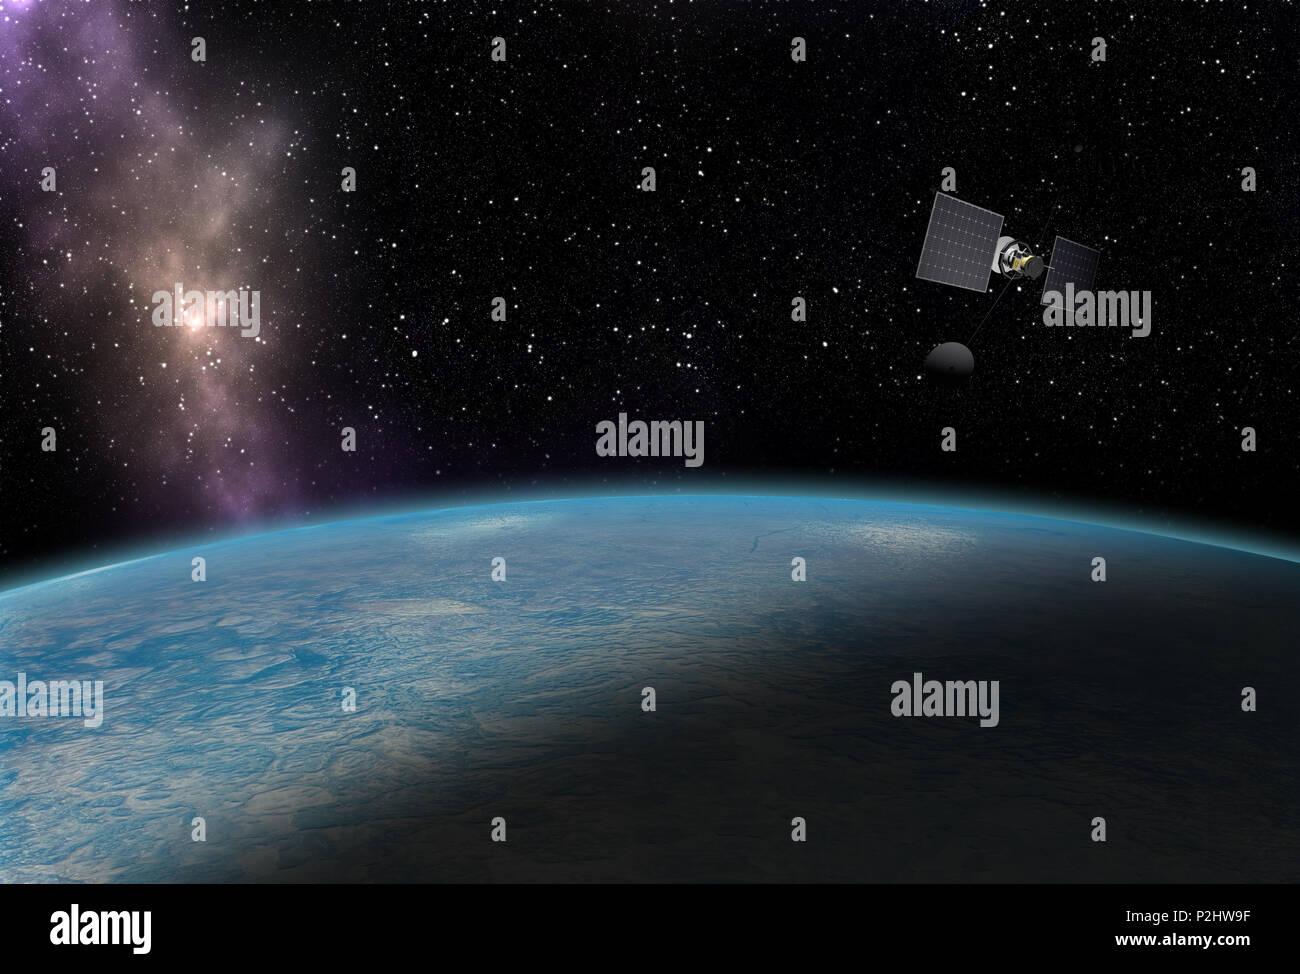 Satellite flying over blue planet - Stock Image